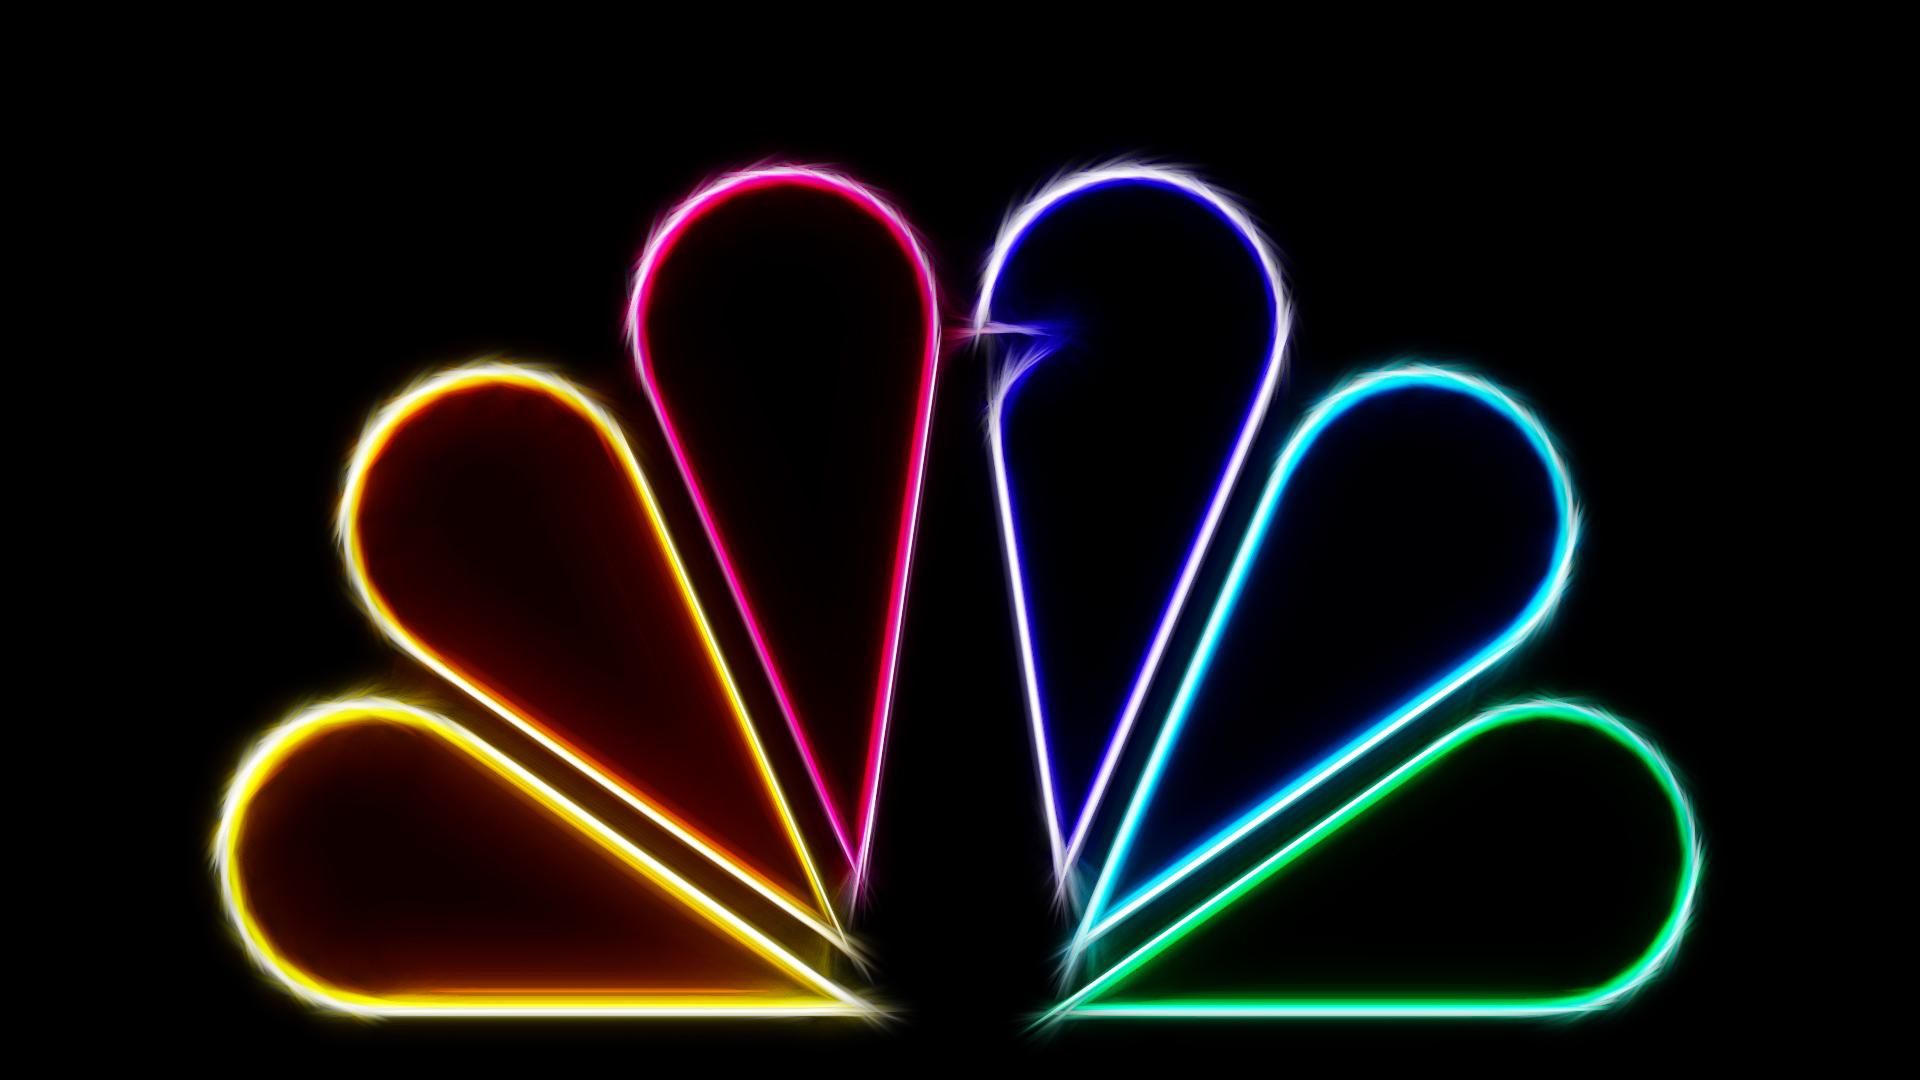 NBC News Logo PNG Transparent & SVG Vector - Freebie Supply  |Nbc News Logo Black